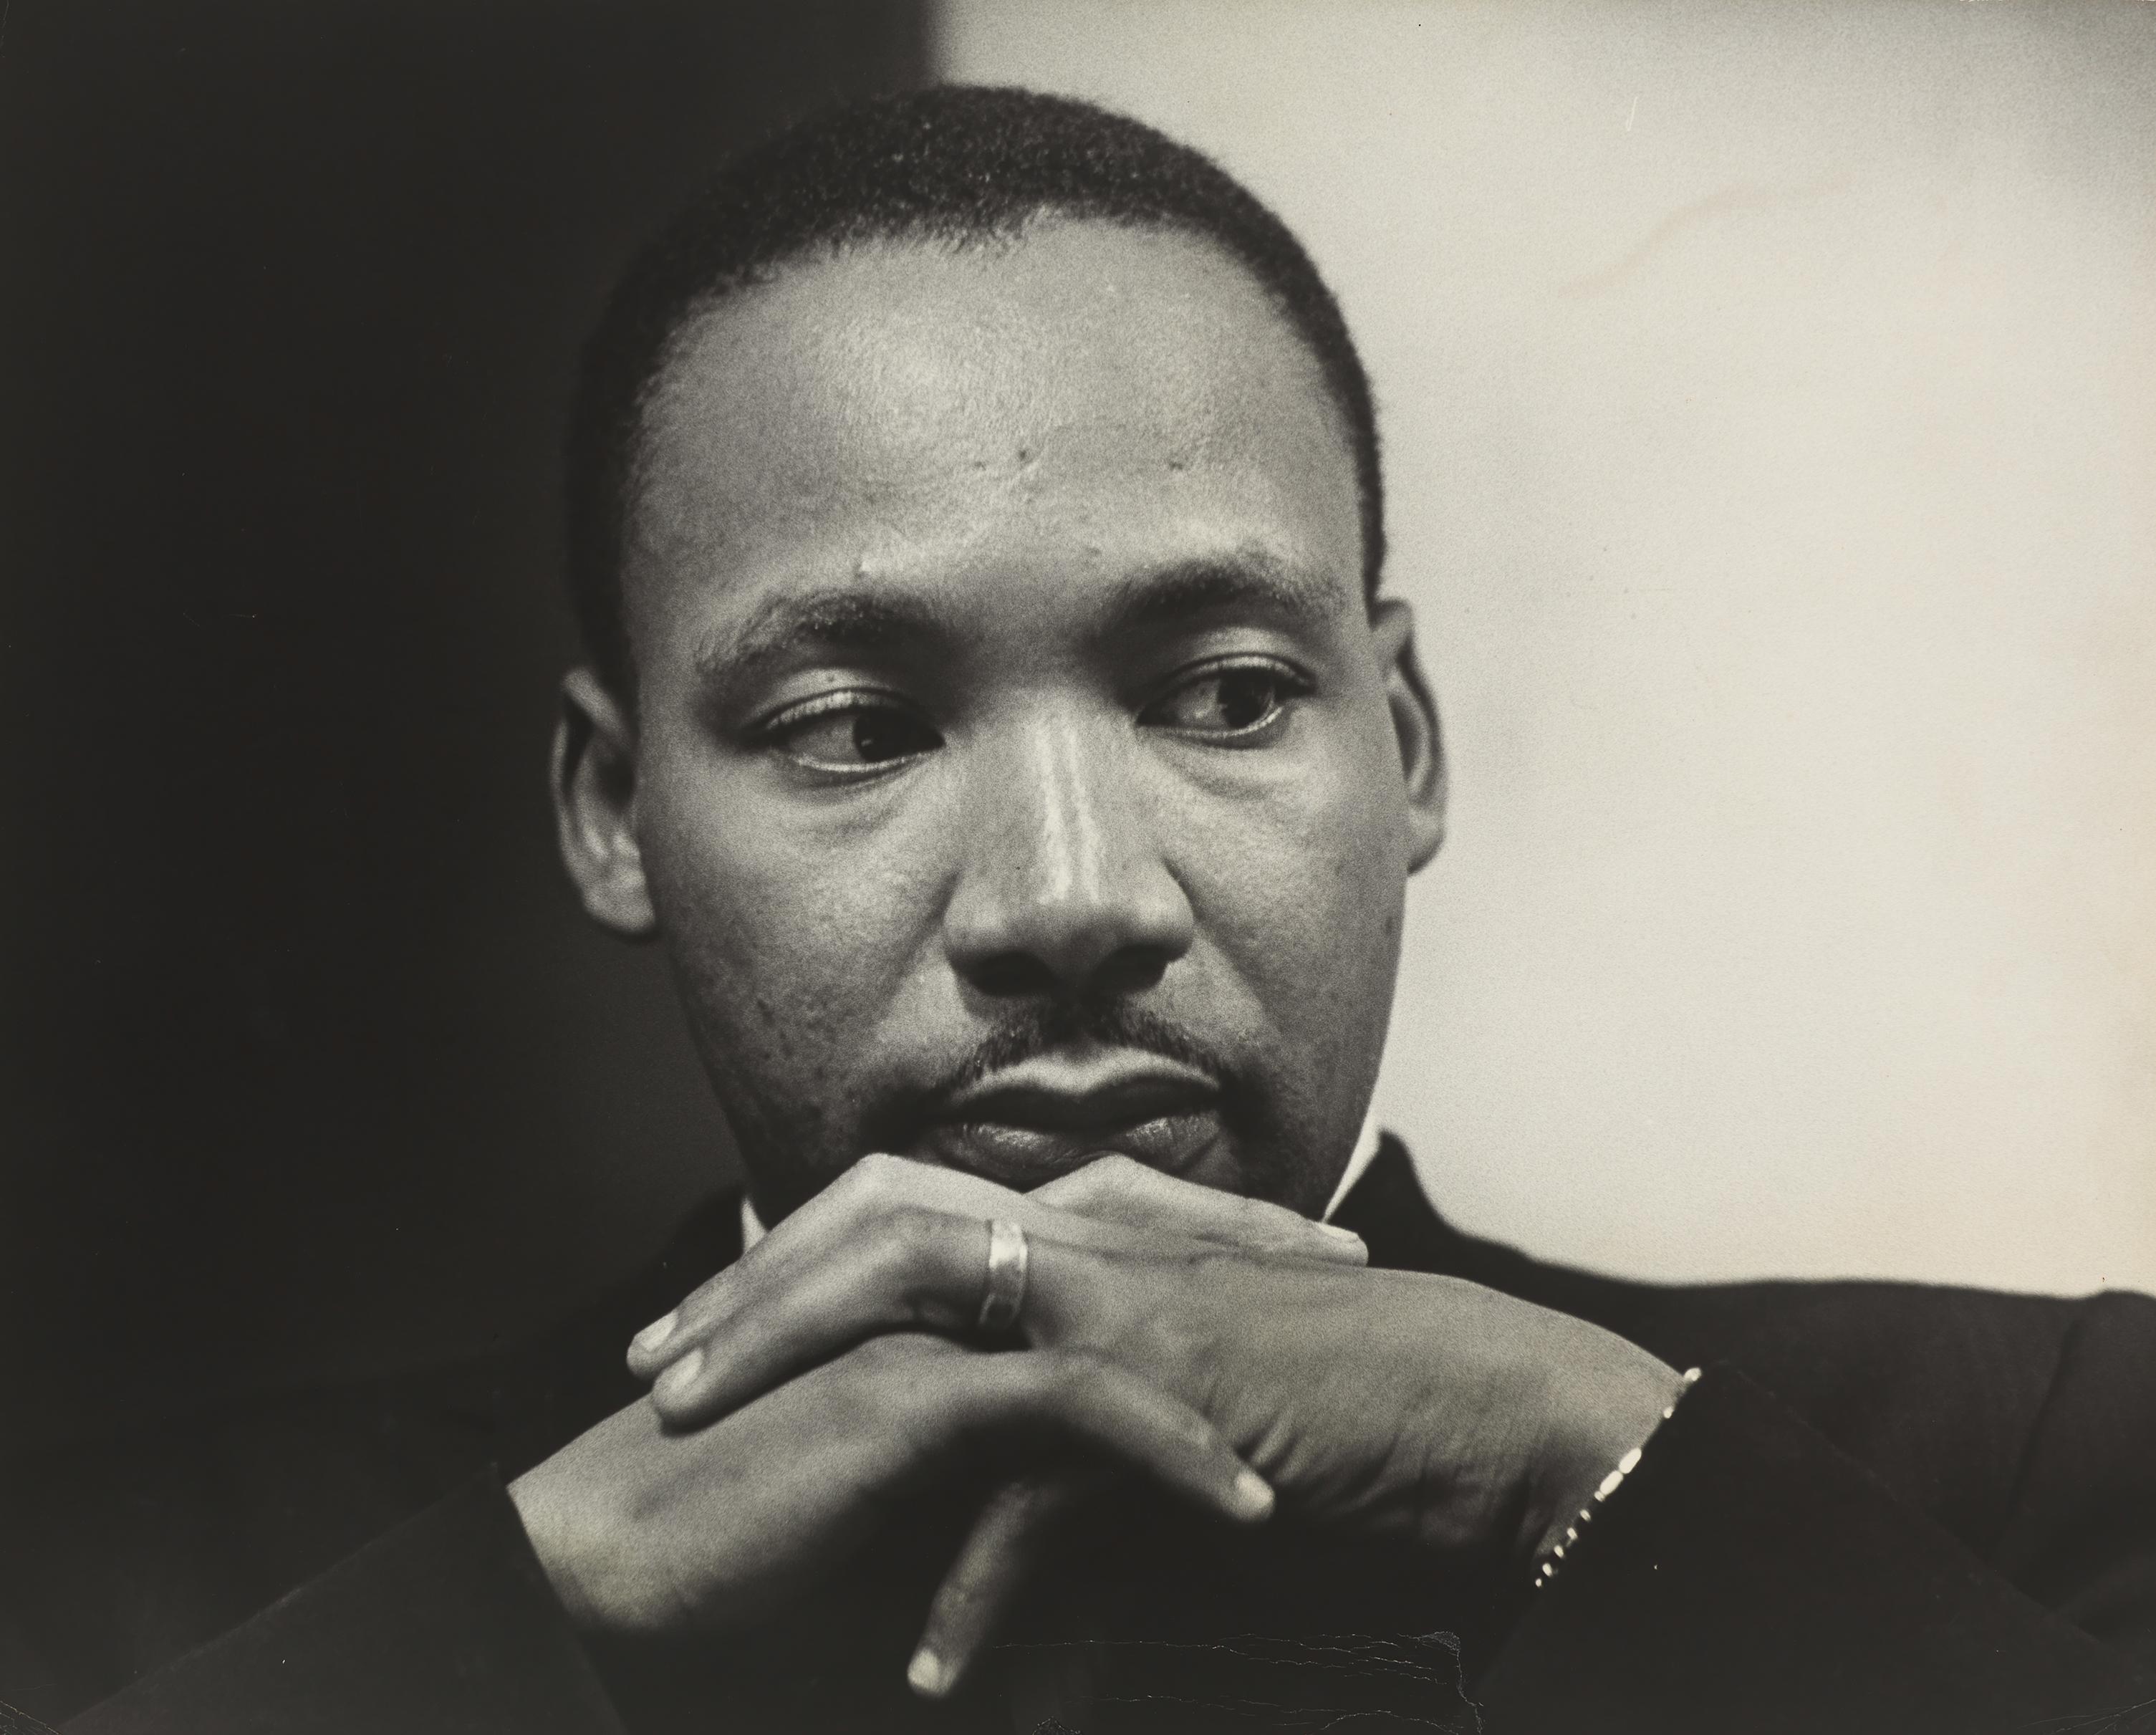 Black and white photo of MLK Jr